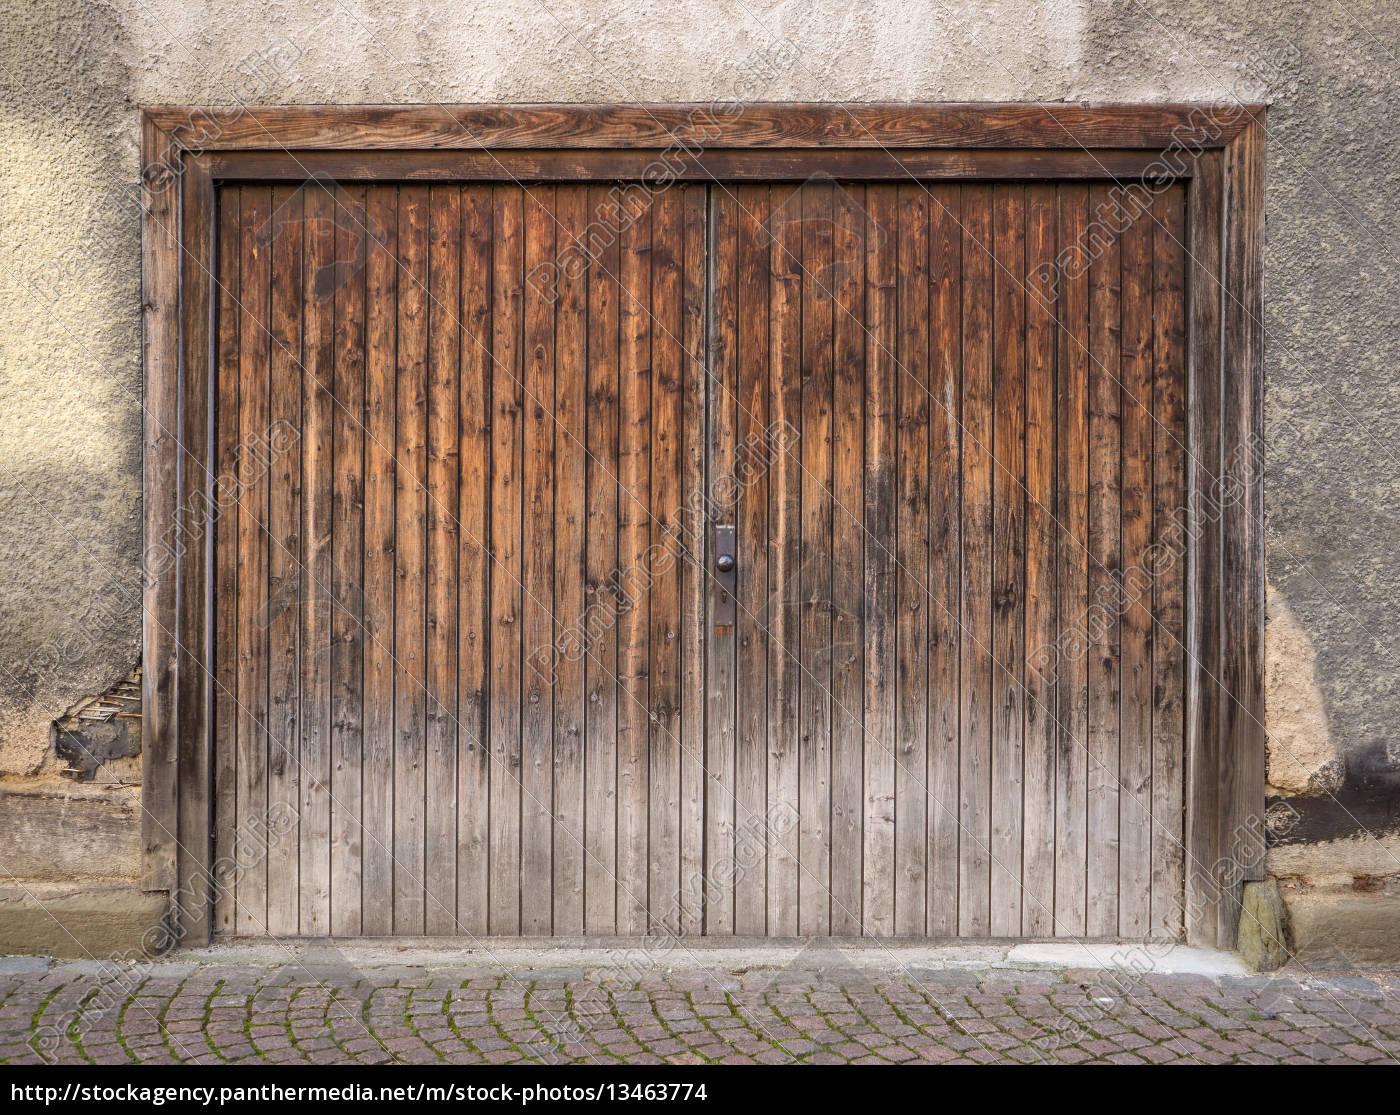 verwittertes braunes garagentor aus holz stock photo 13463774 bildagentur panthermedia. Black Bedroom Furniture Sets. Home Design Ideas